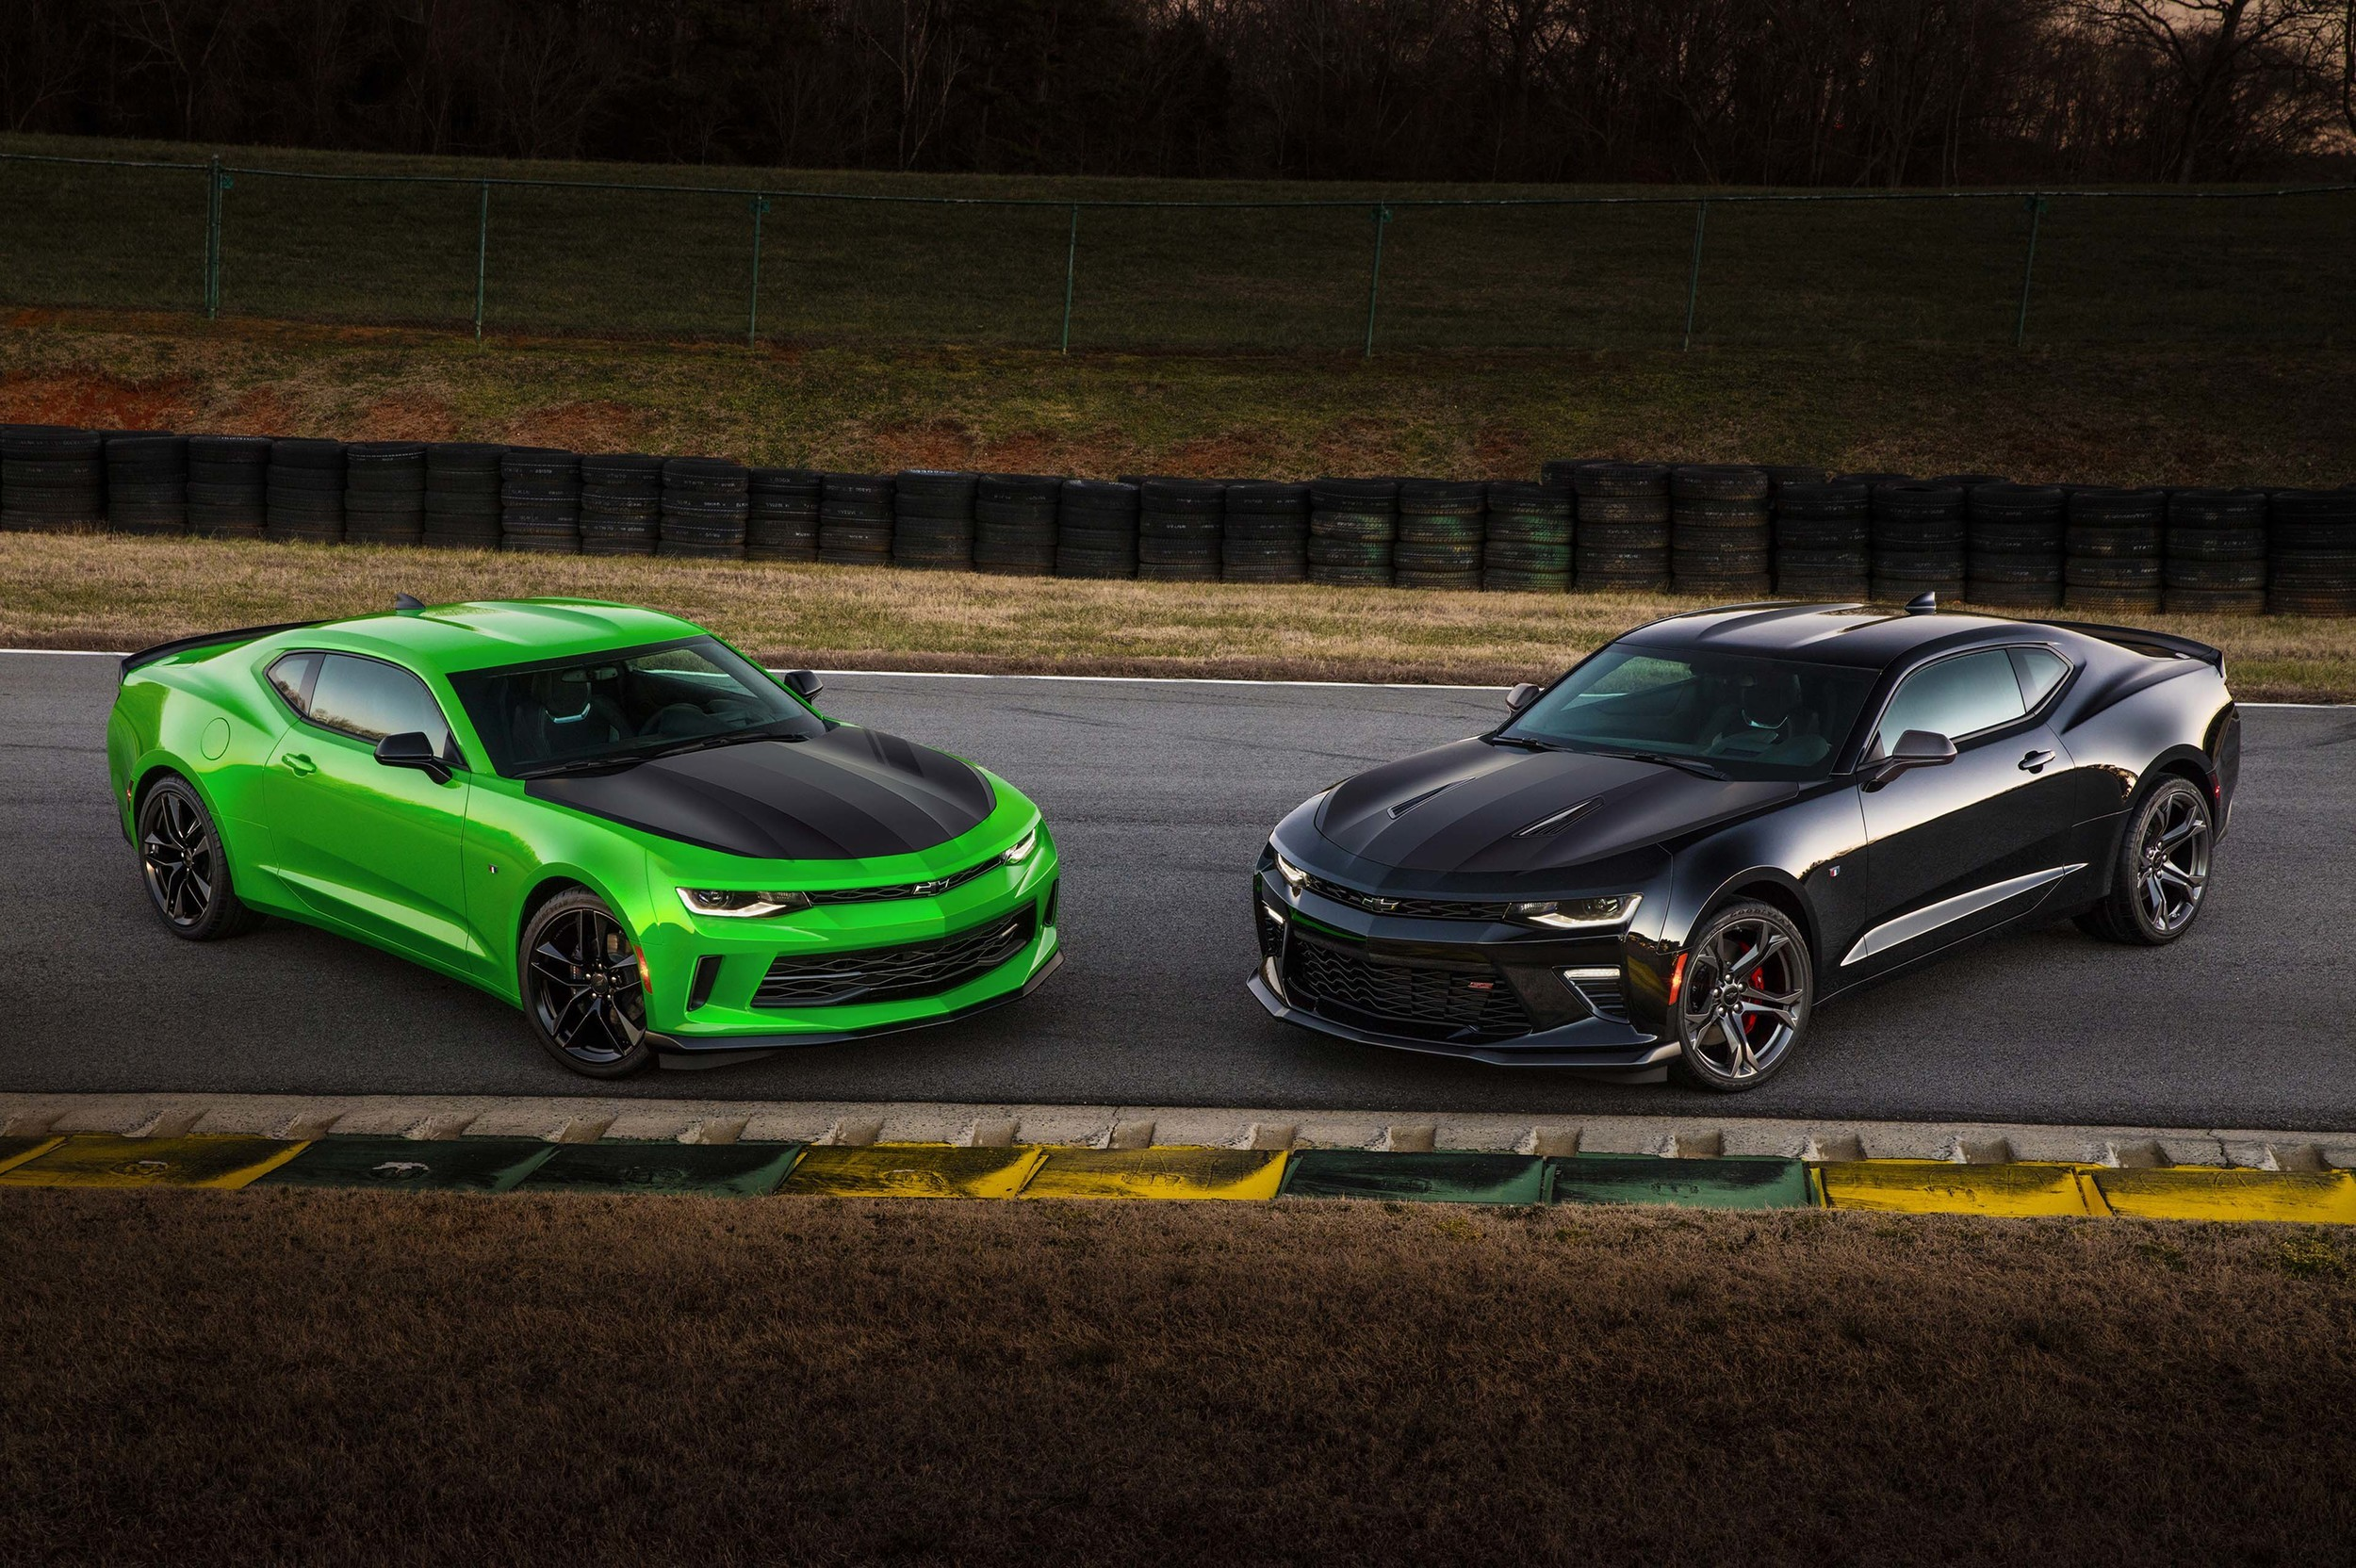 Image: Cars, green, black, supercars, road, Chevrolet, Camaro